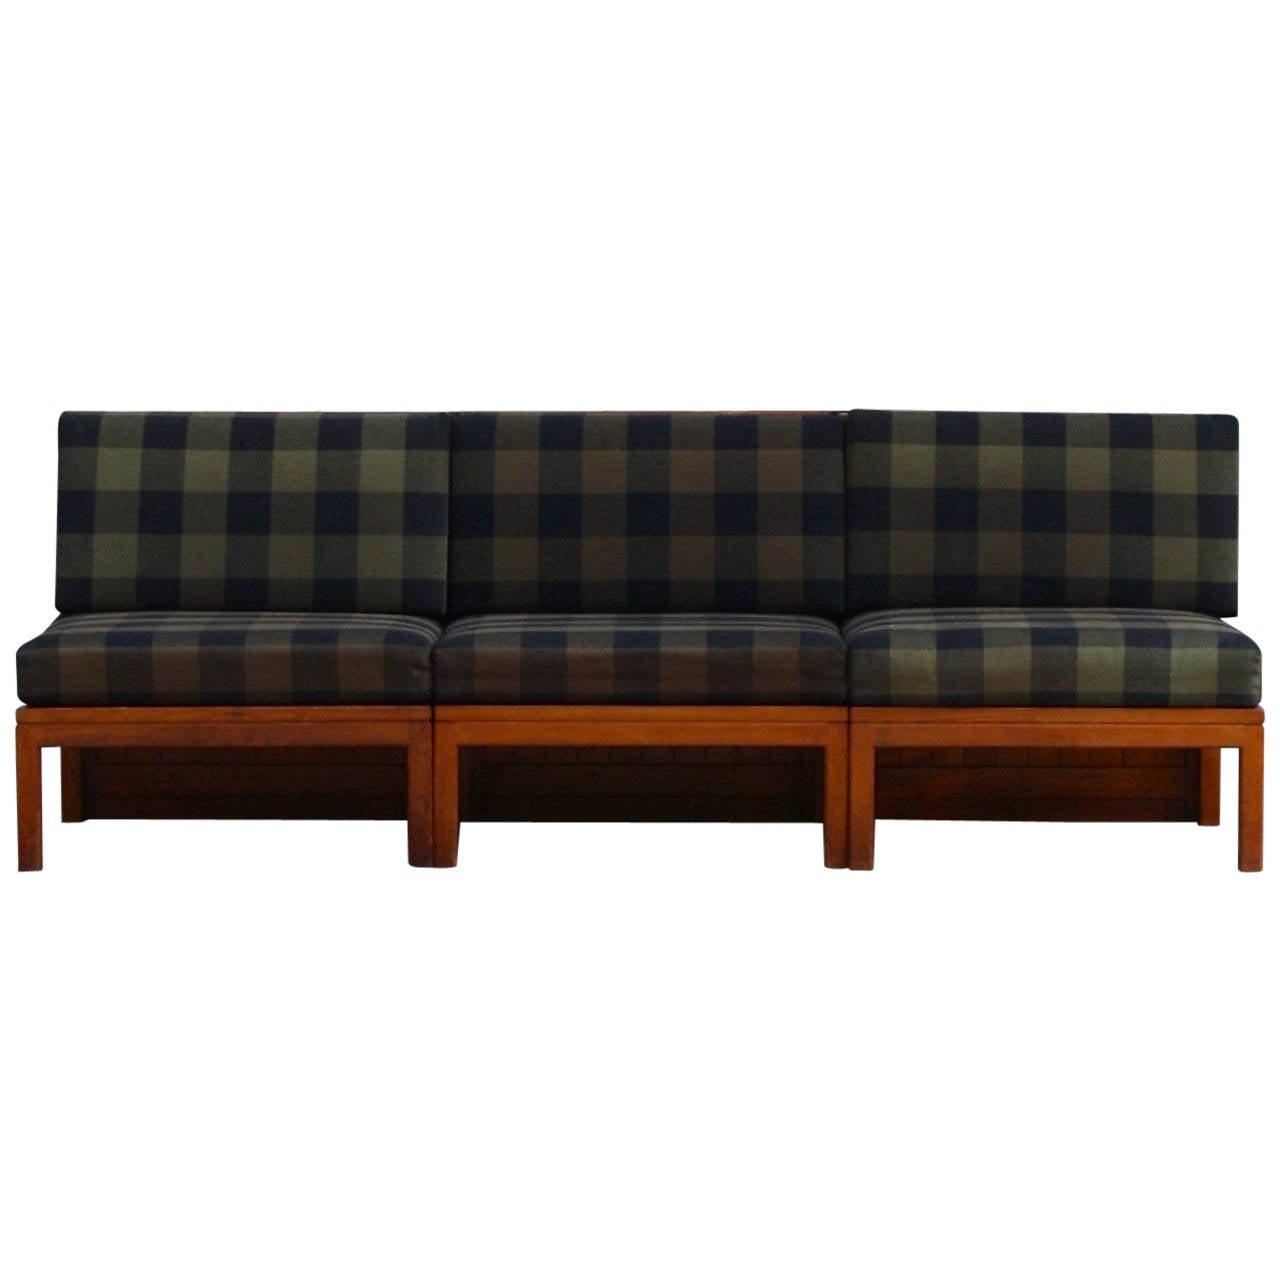 Mogens Koch Three-Piece Modular Sofa